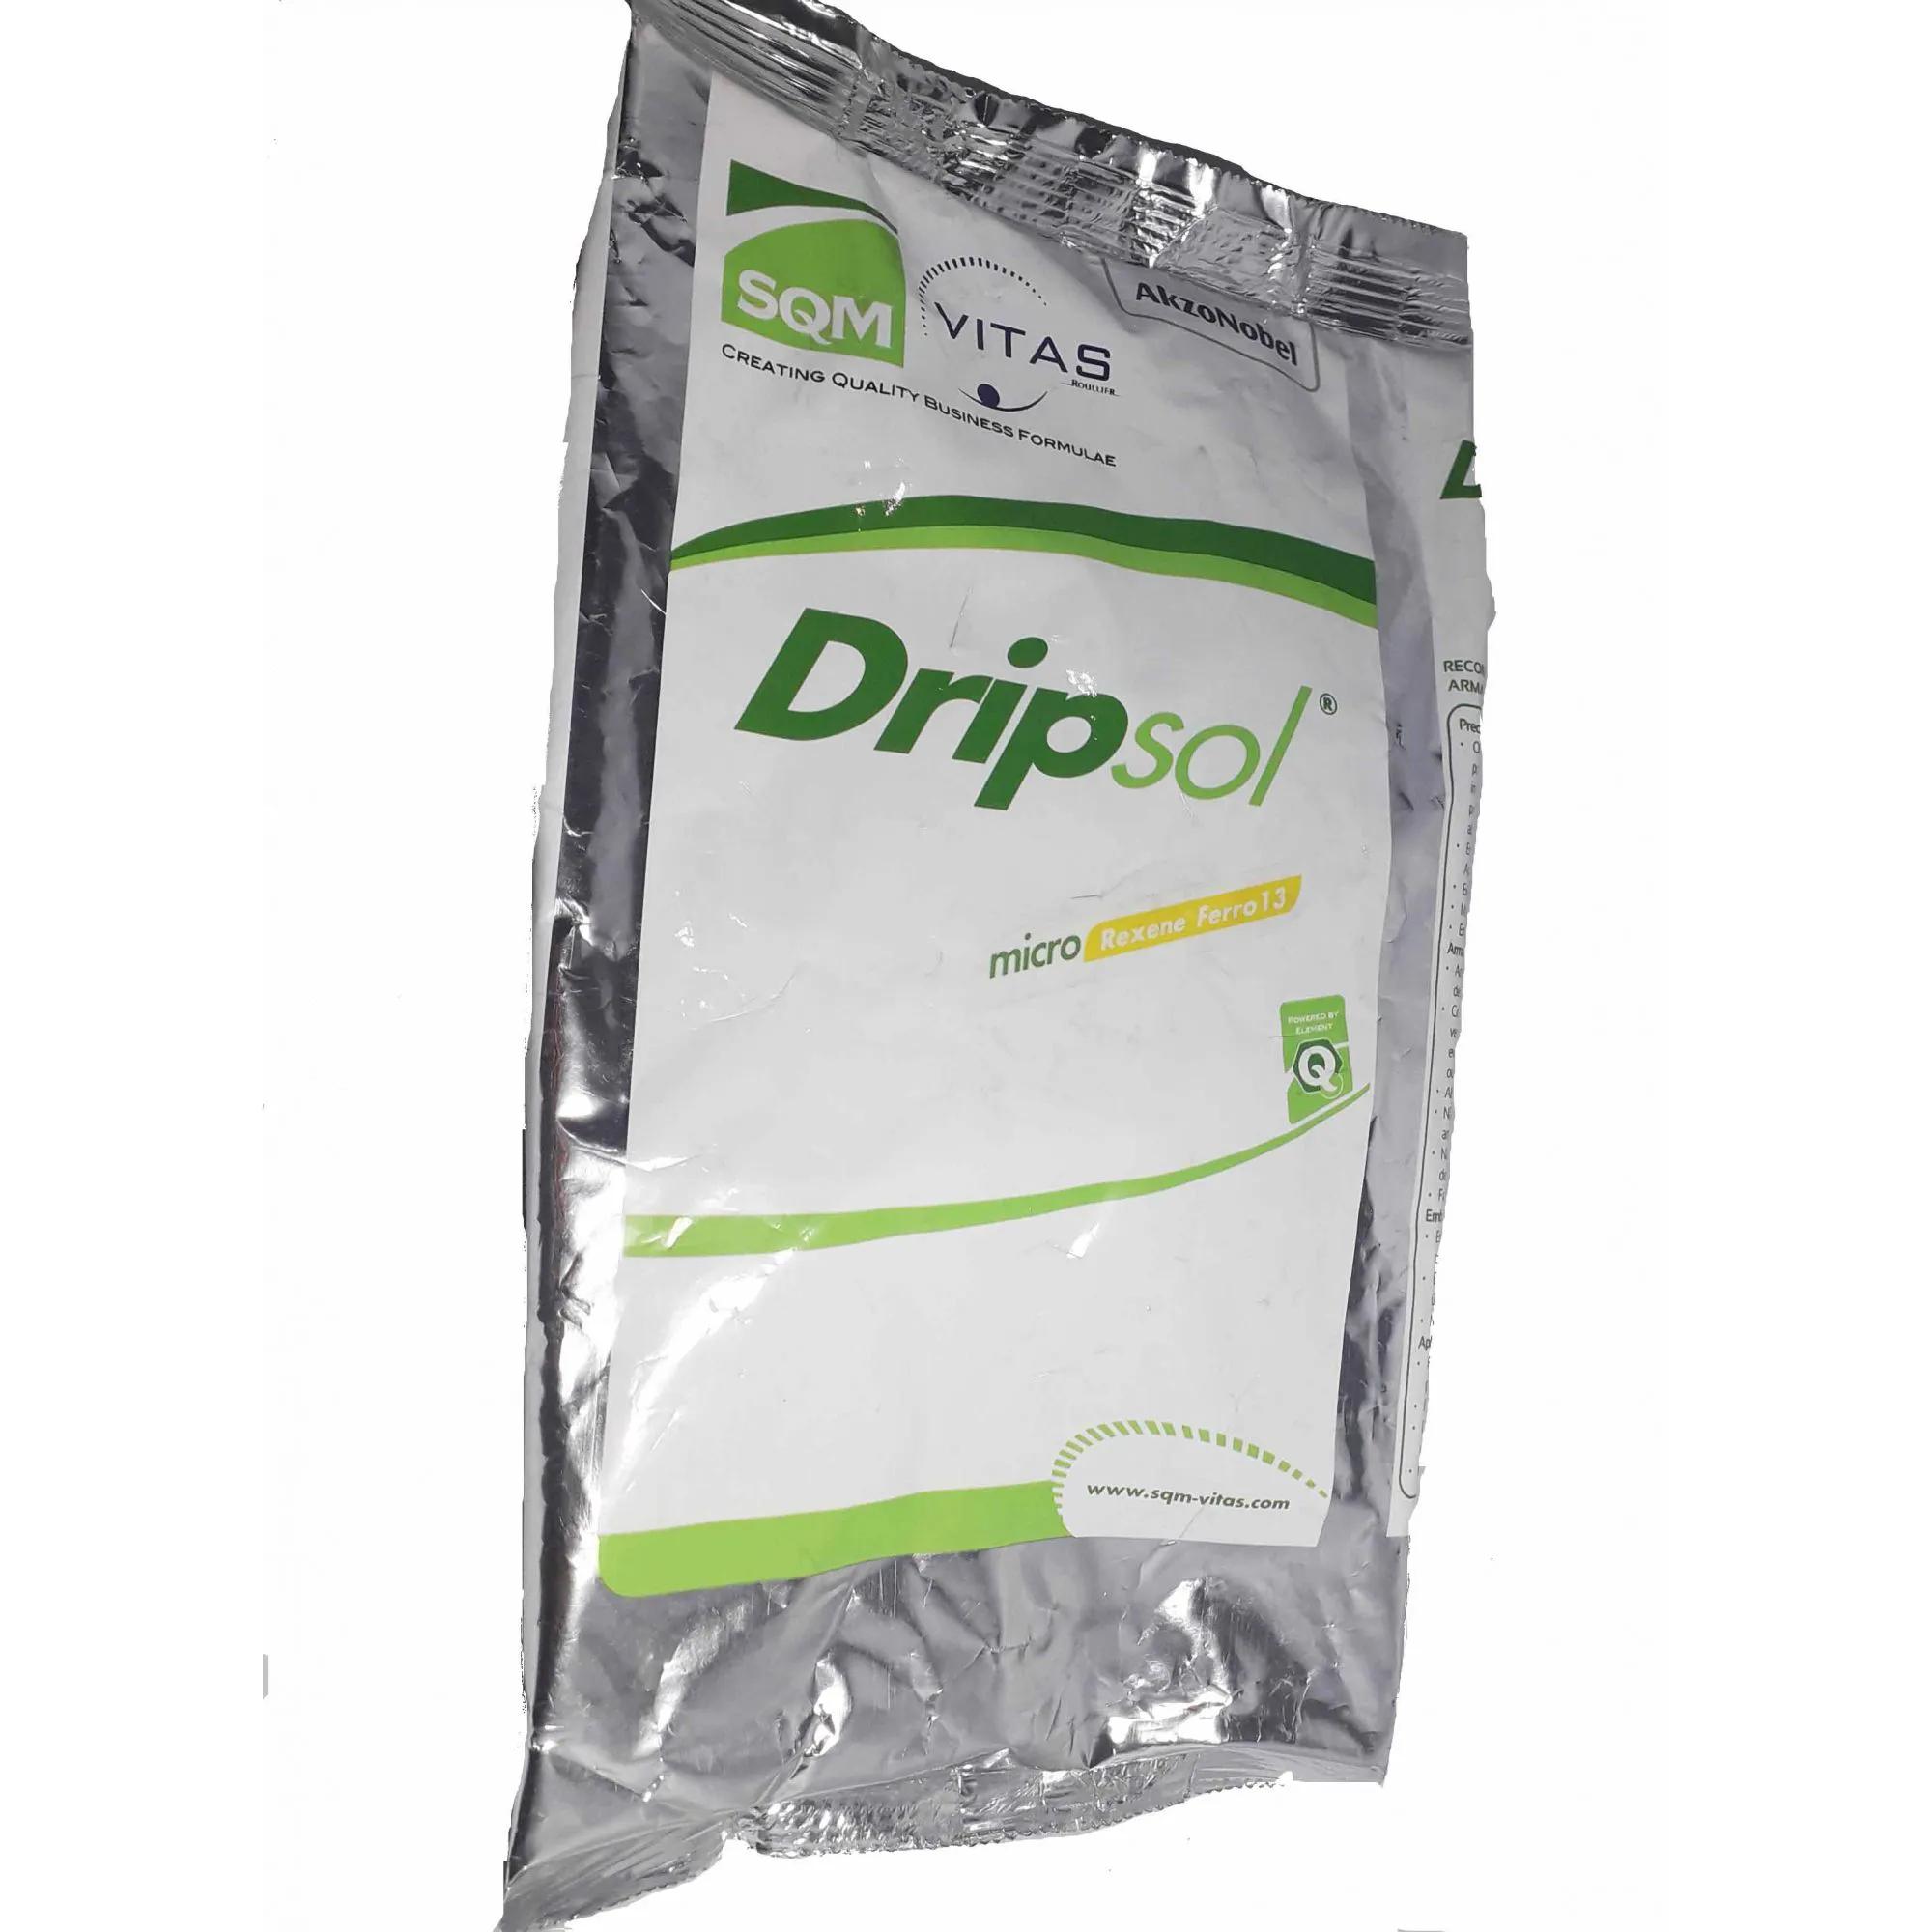 Dripsol micro Rexene FERRO 13 - 700GR